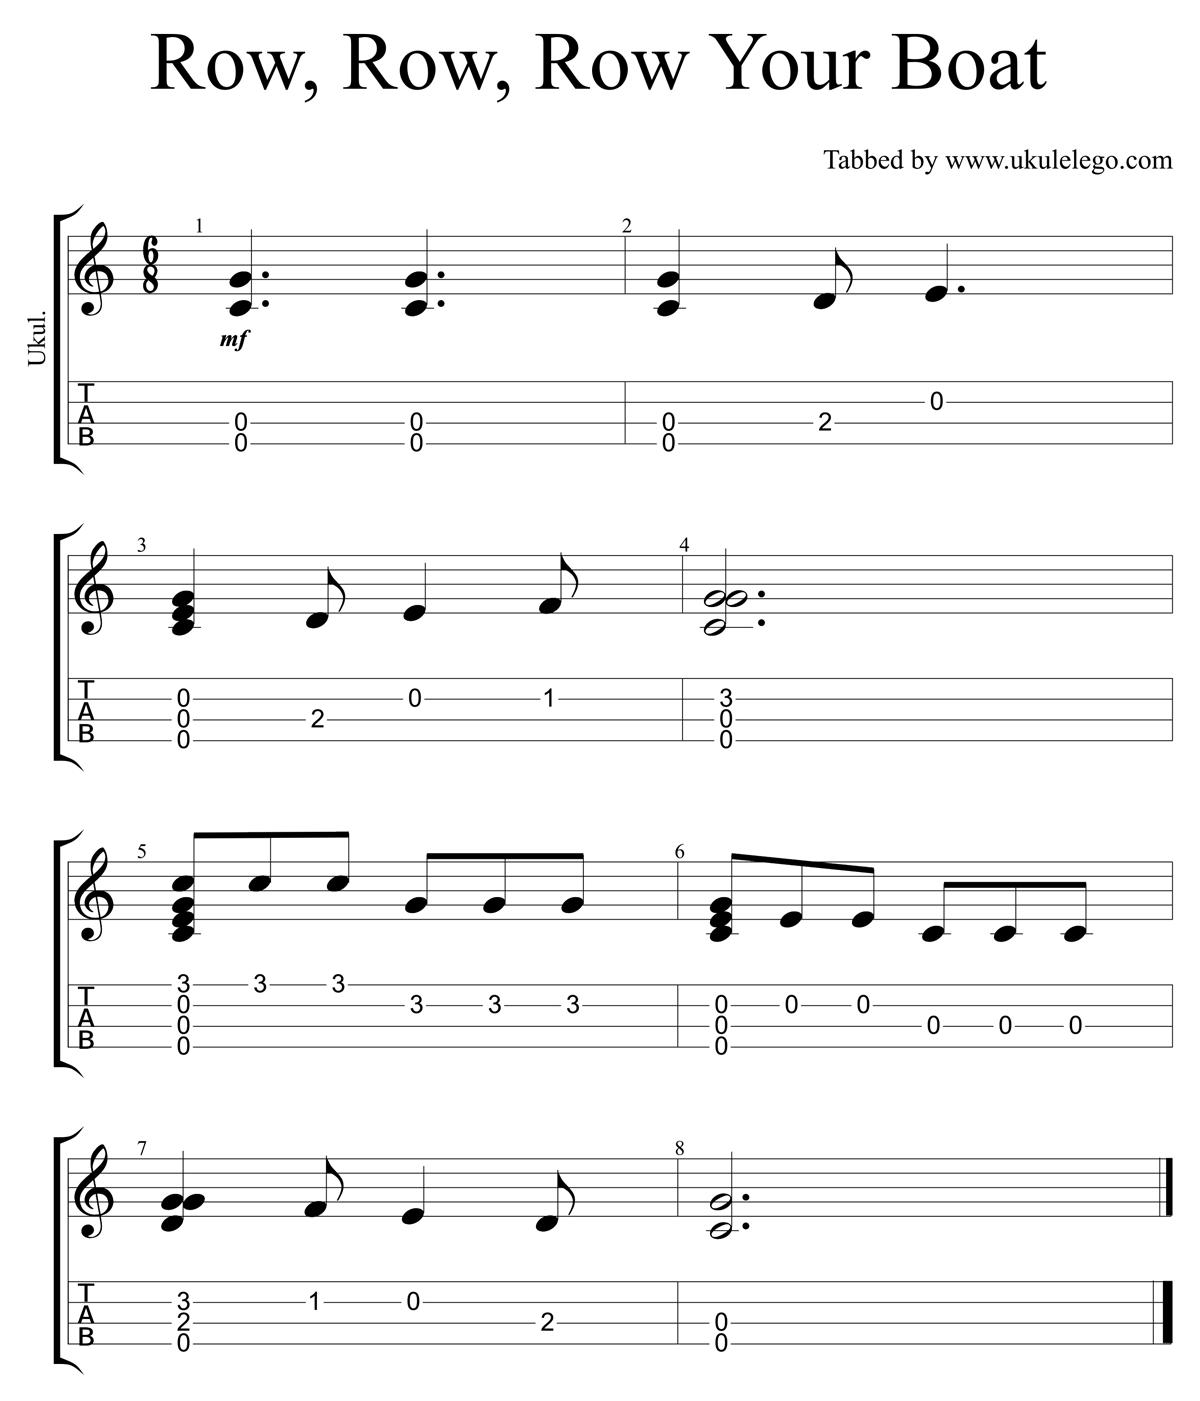 Row row row your boat simple ukulele arrangement ukulele go row row row your boat ukulele tab hexwebz Choice Image